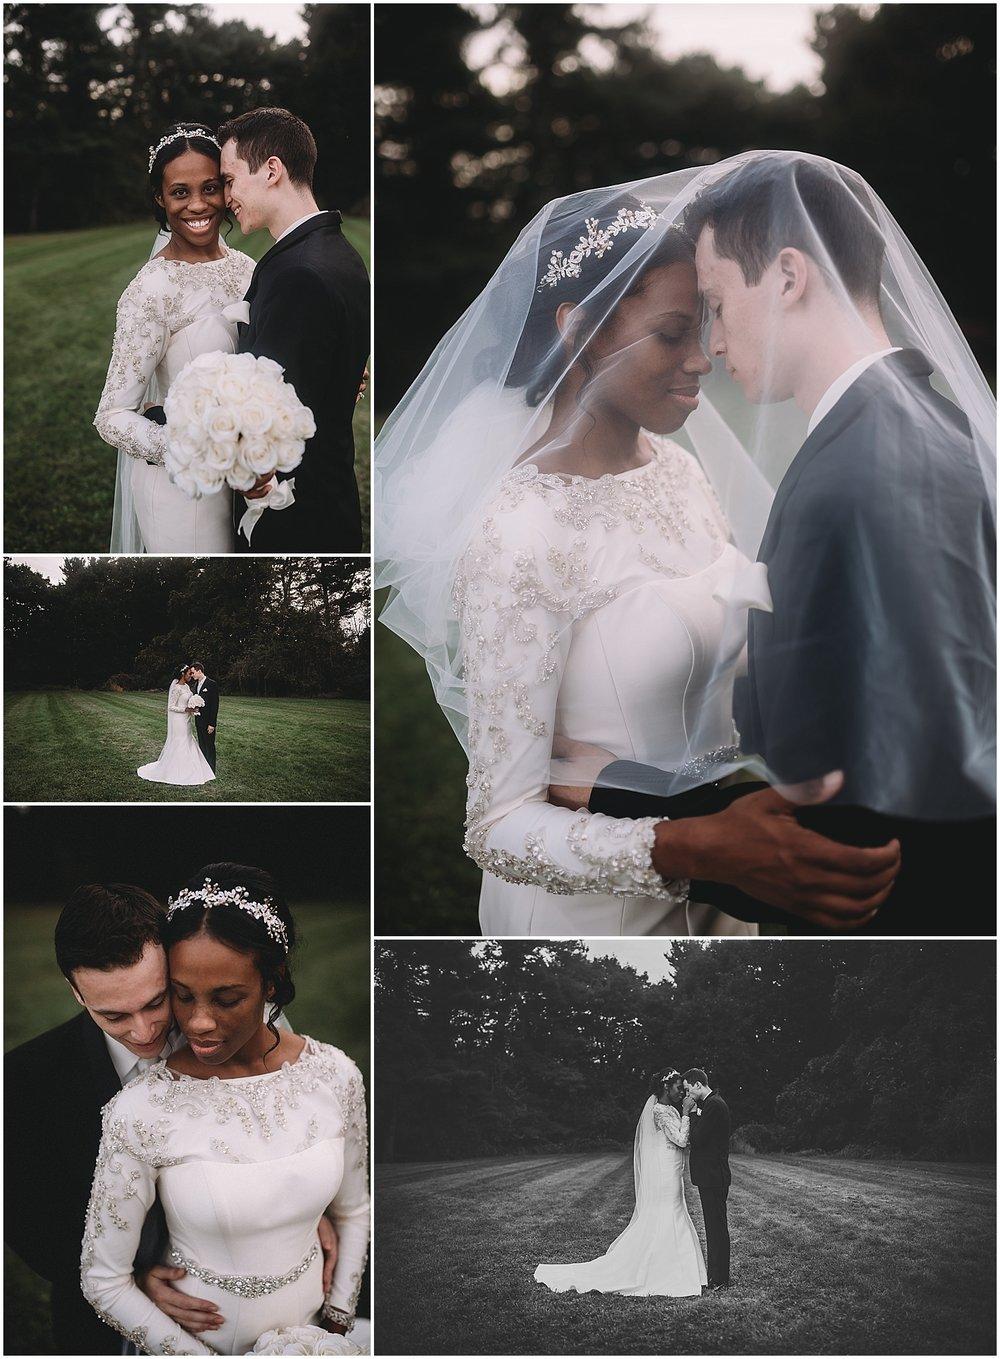 NEPA-Scranton-wedding-engagement-photographer-in-York-PA-Central-PA_0123.jpg